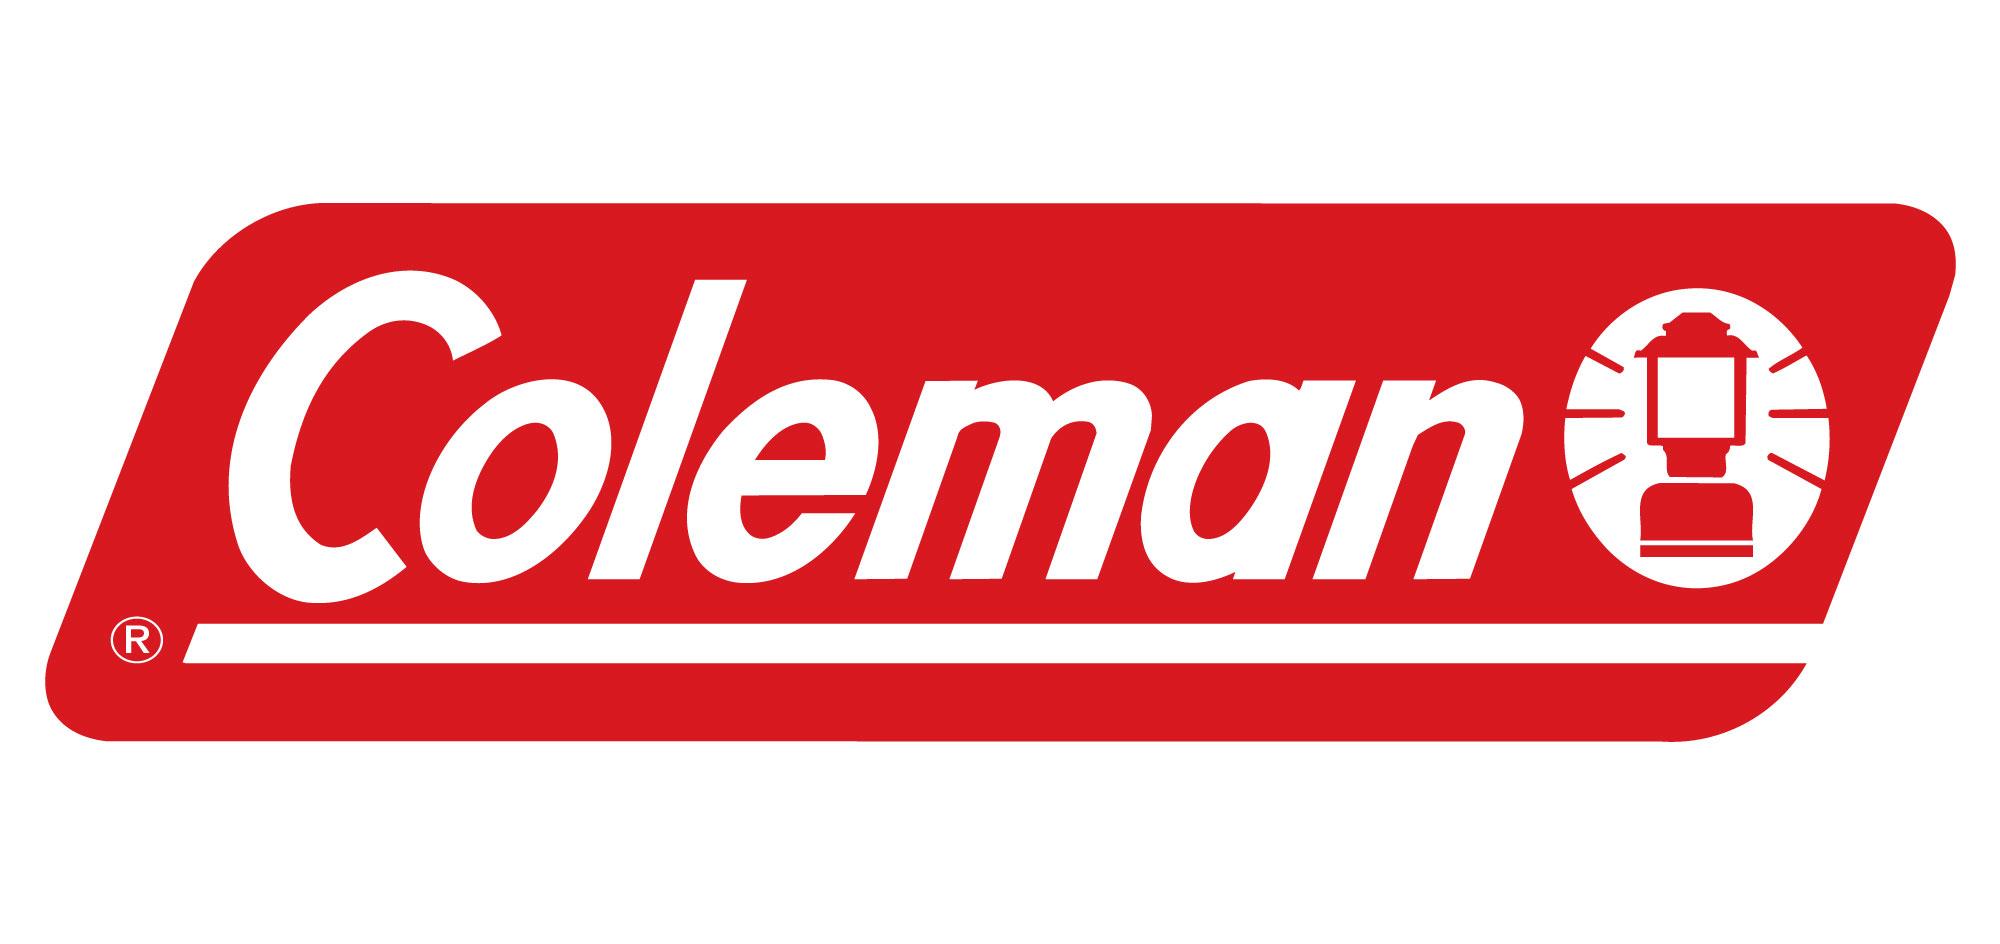 Coleman Logo Wallpaper